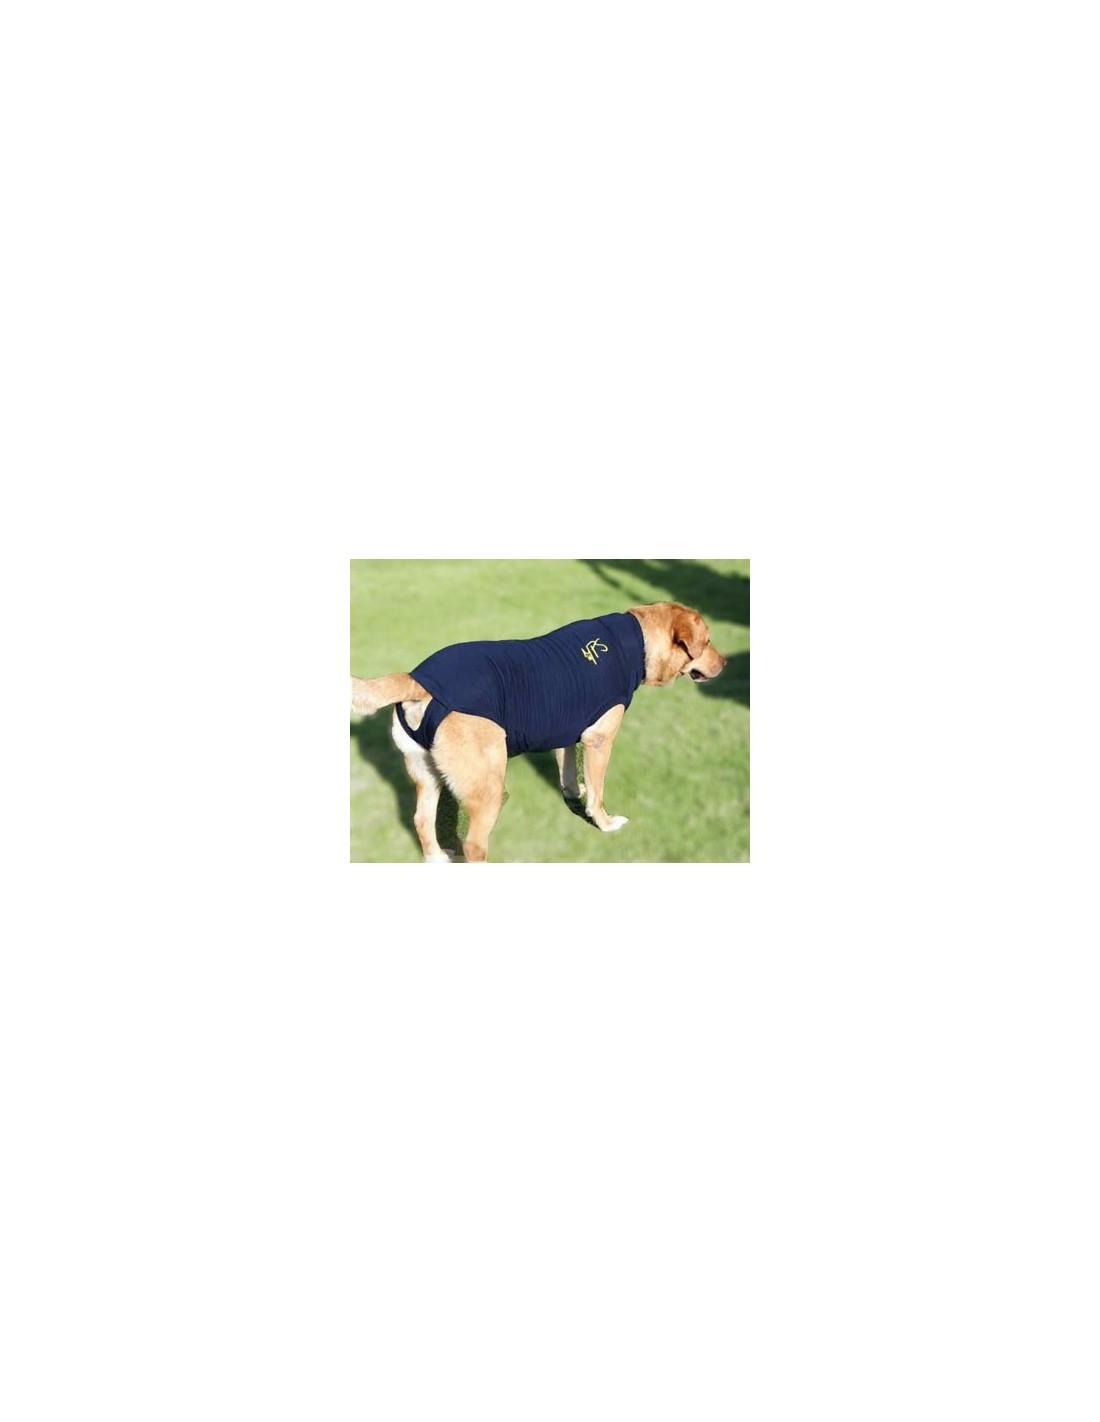 camiseta protectora para perros operados, camiseta quirúrgica para ...